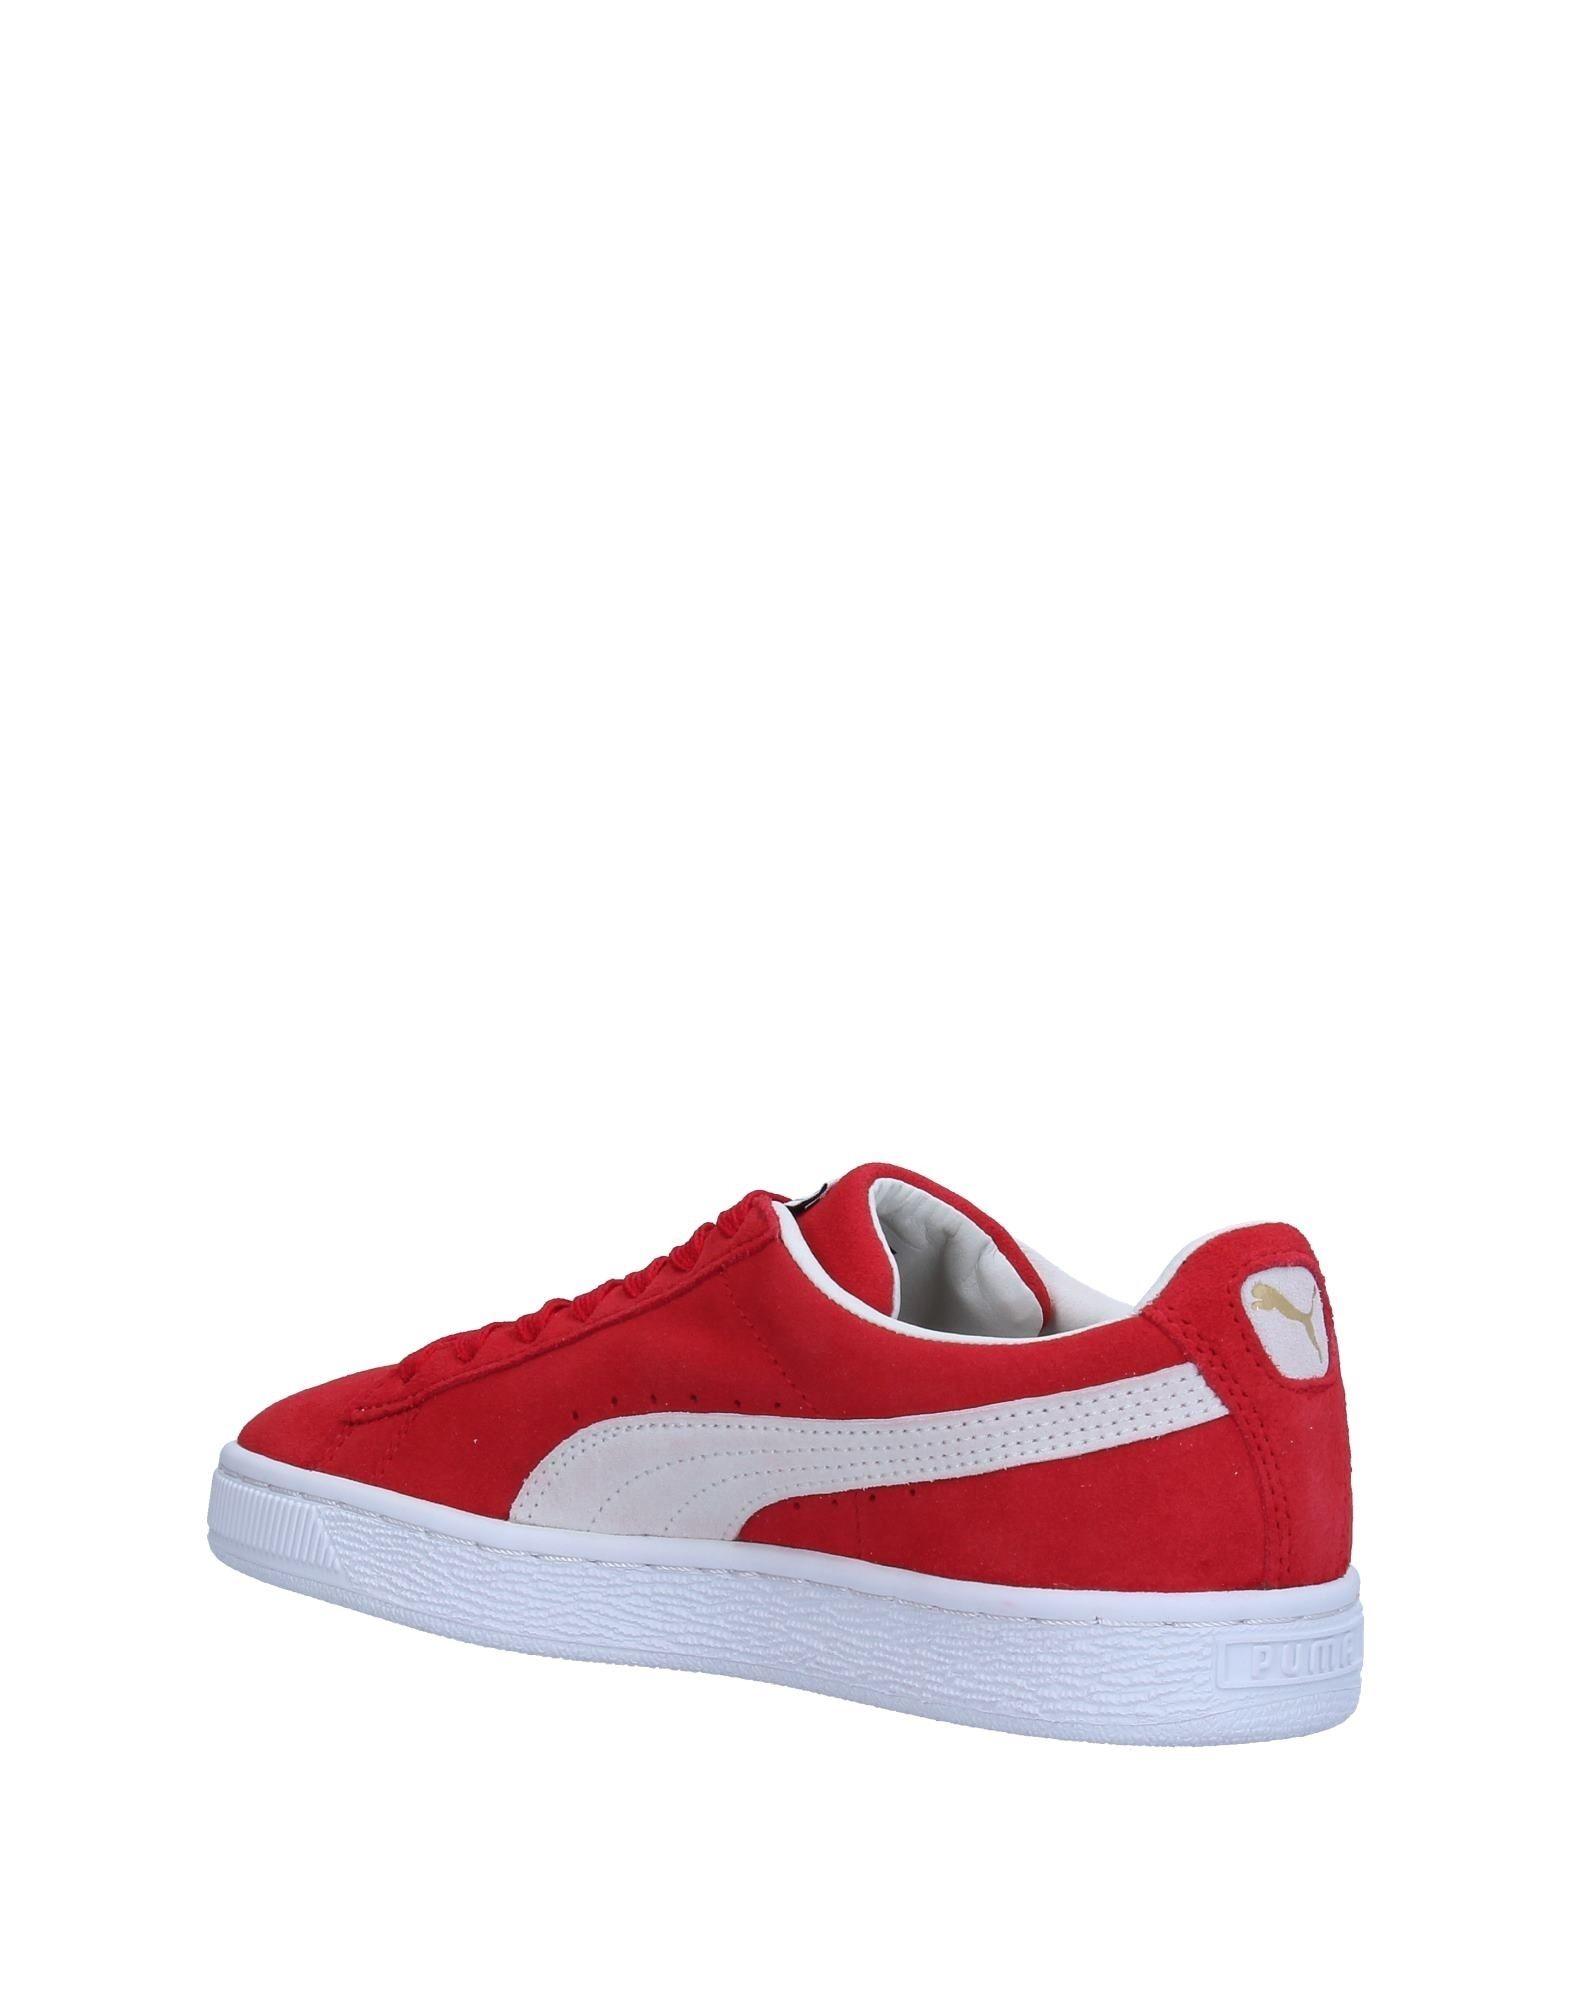 Puma Sneakers Damen  11333634NN 11333634NN  9846b6